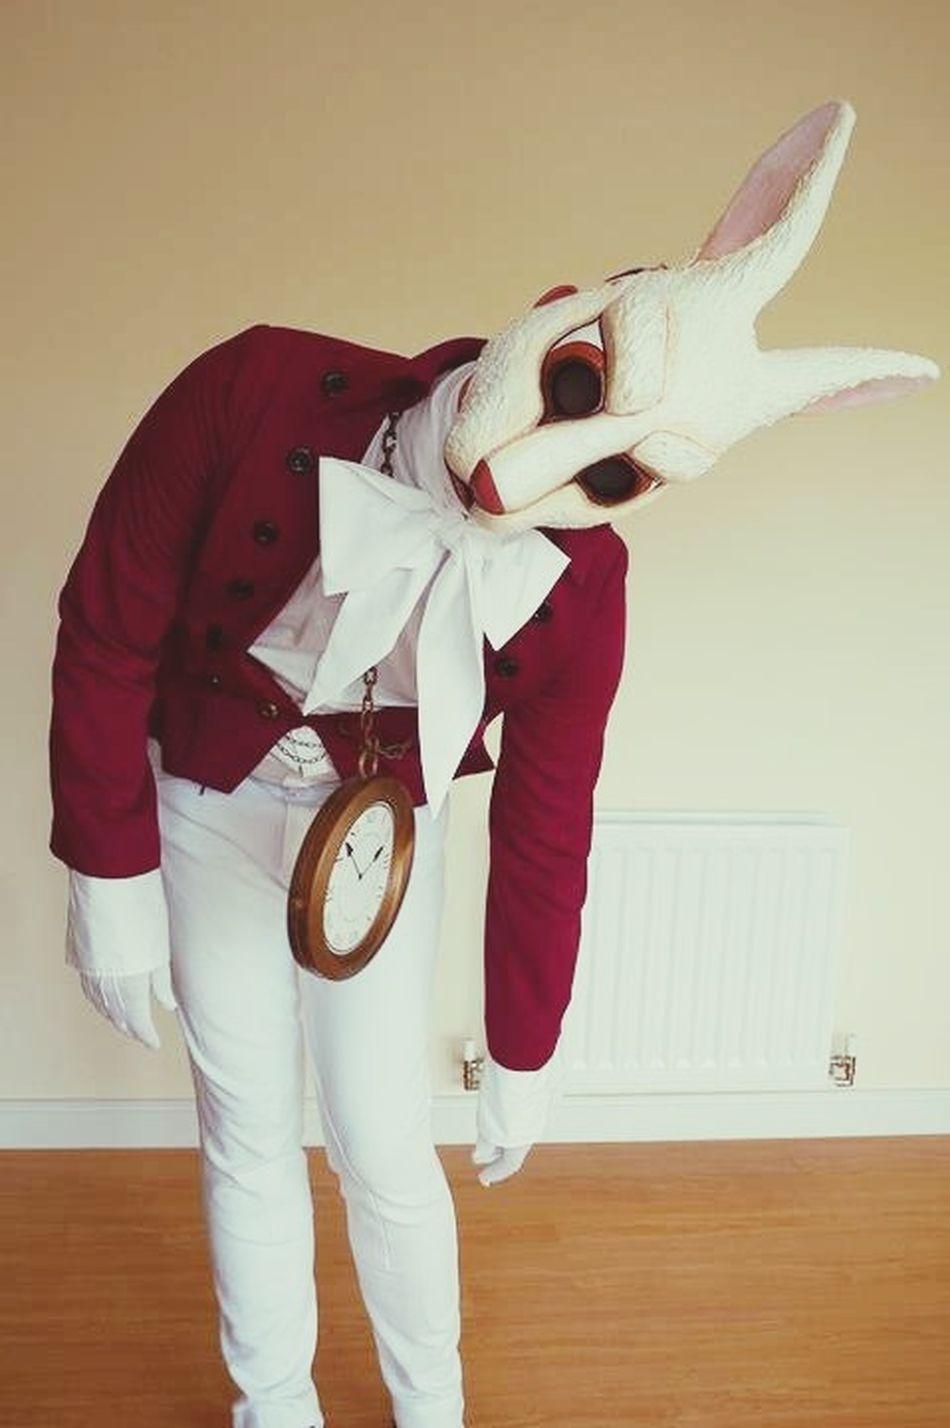 Rabbit Fancy Dress Whiterabbit Birthday Party 30thBirthday Alice In Wonderland This was for a 30th Birthday Party.